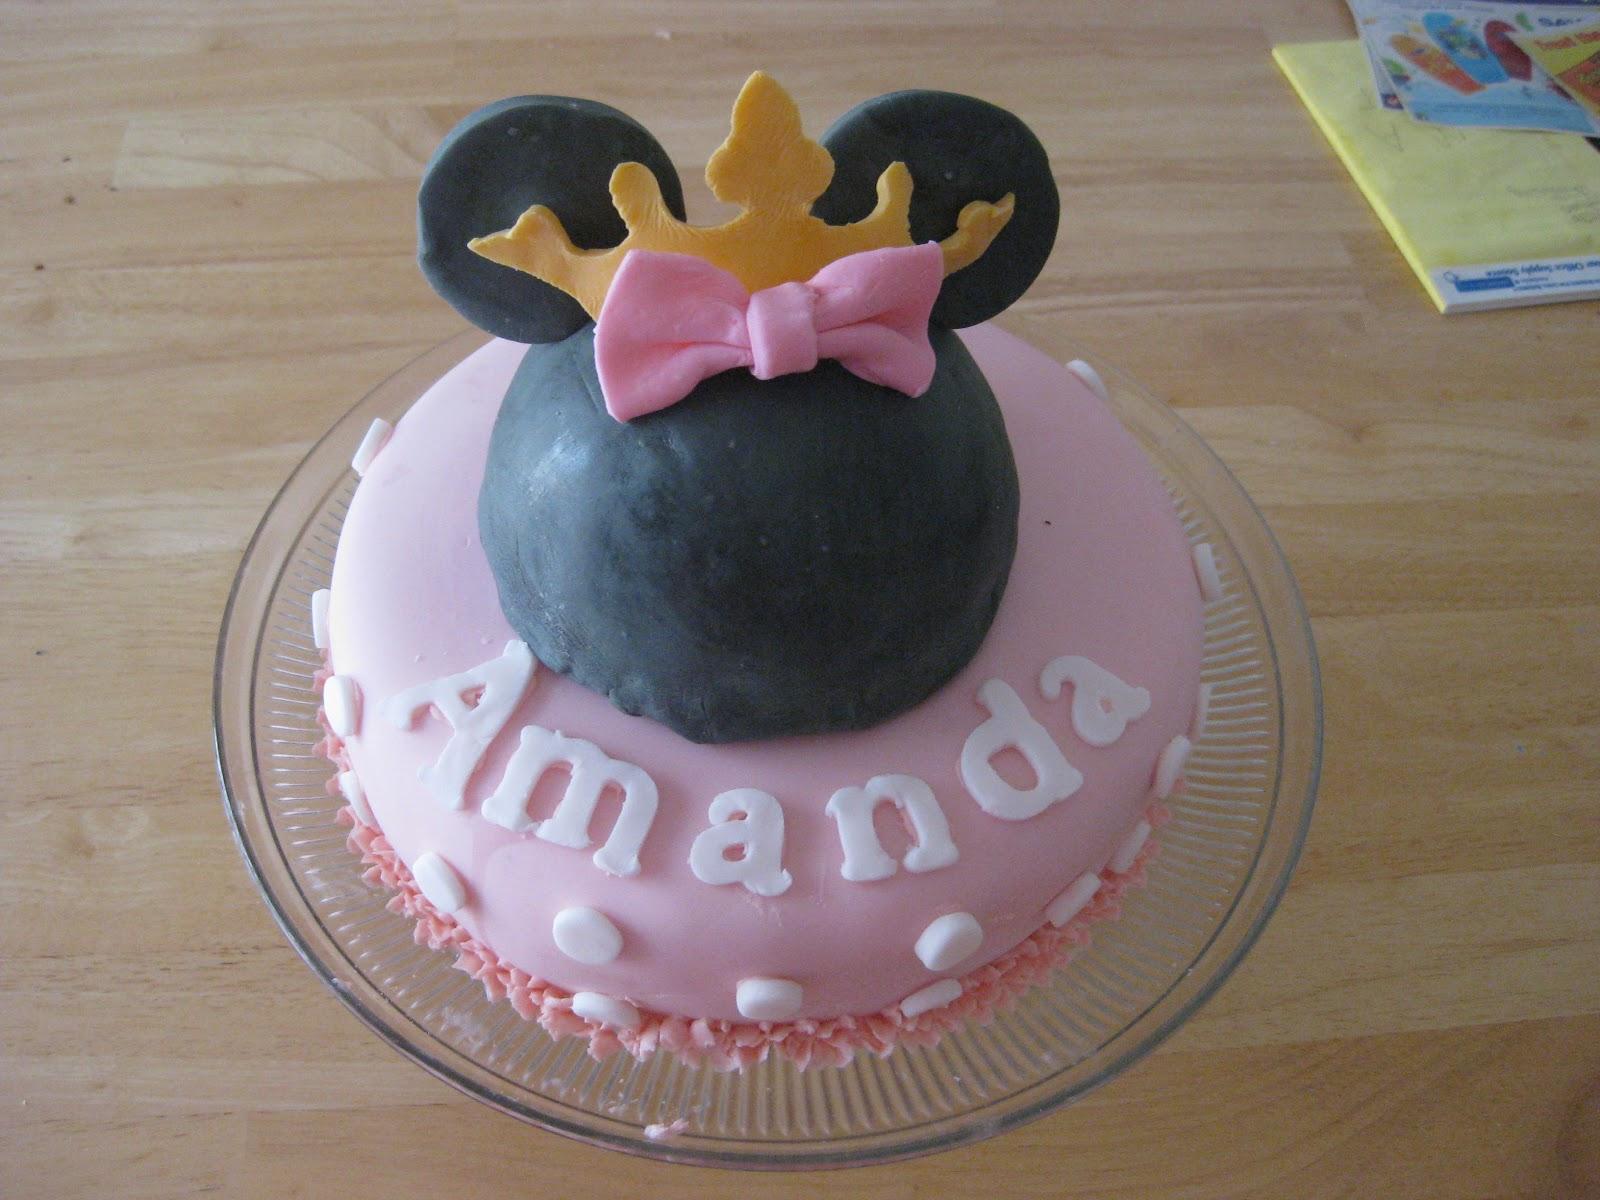 Heaven scent creations princess minnie mouse cake - Princesse minnie ...